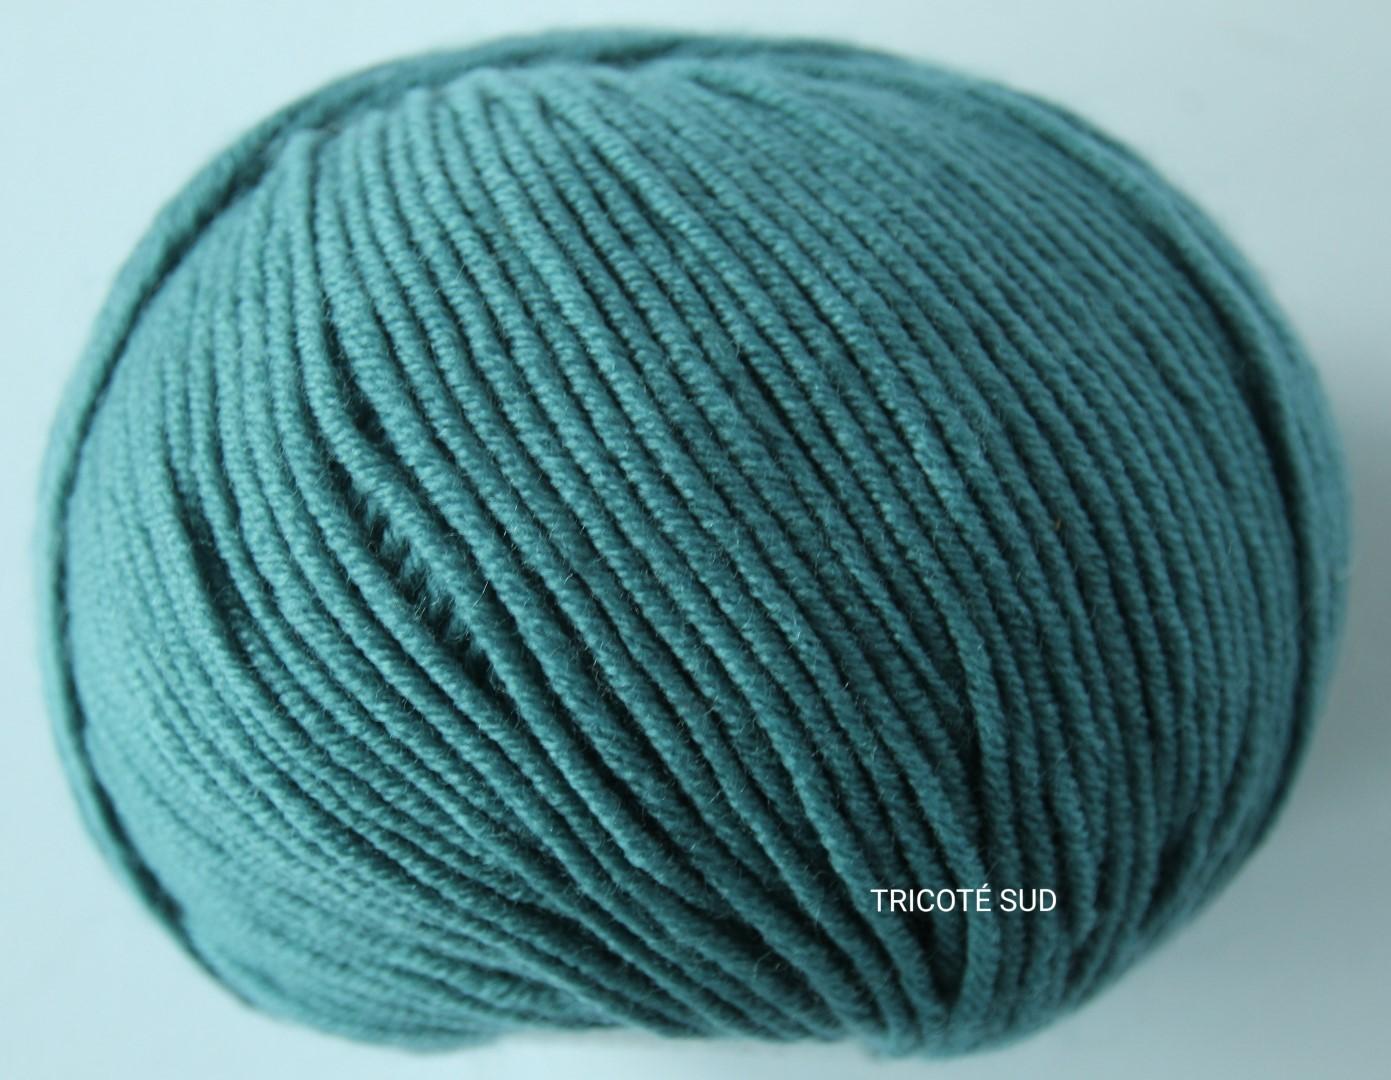 MERINO 120 COLORIS 274 (2) (Large)